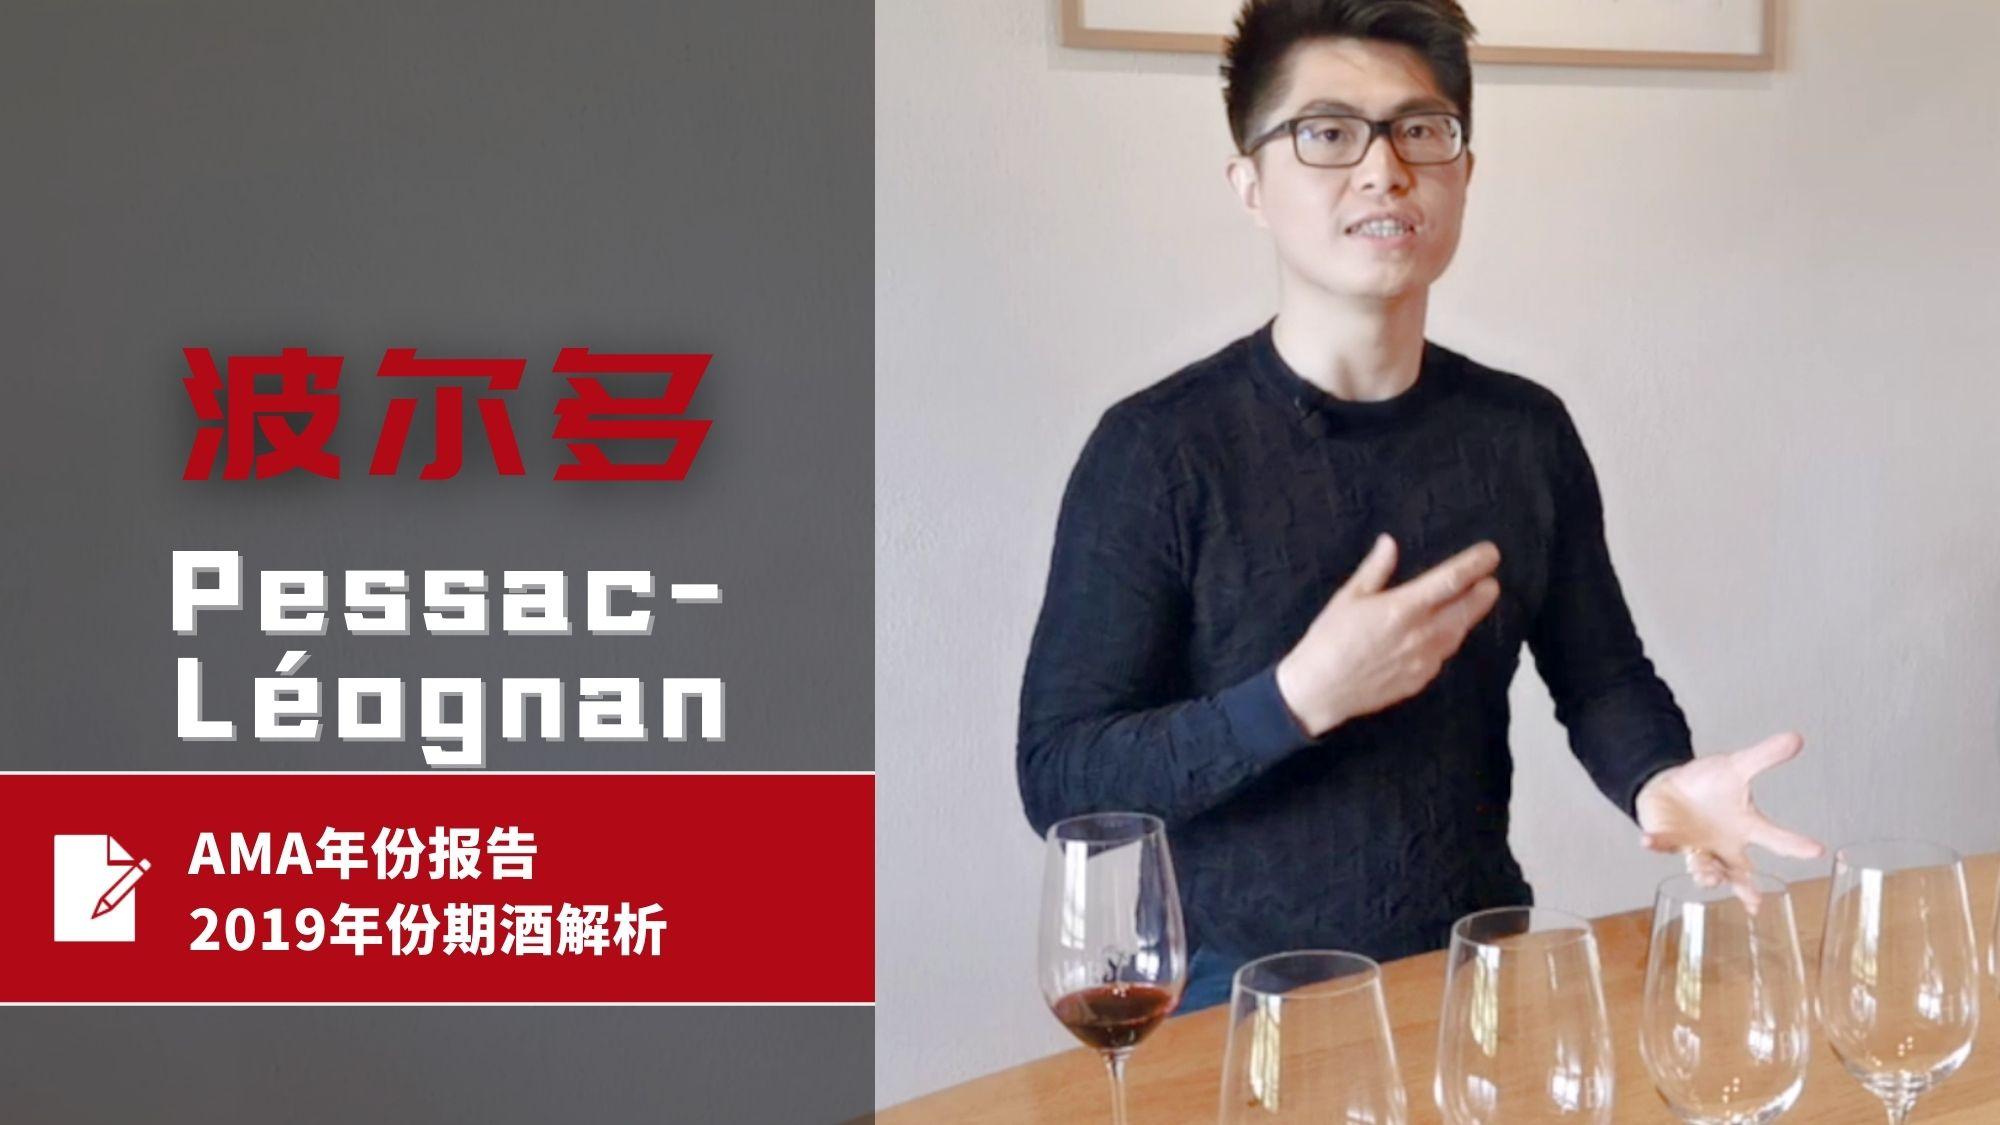 AMA年份报告 – 2019年份波尔多期酒解析 – Pessac-Léognan 佩萨克-雷奥良 - Alexandre Ma